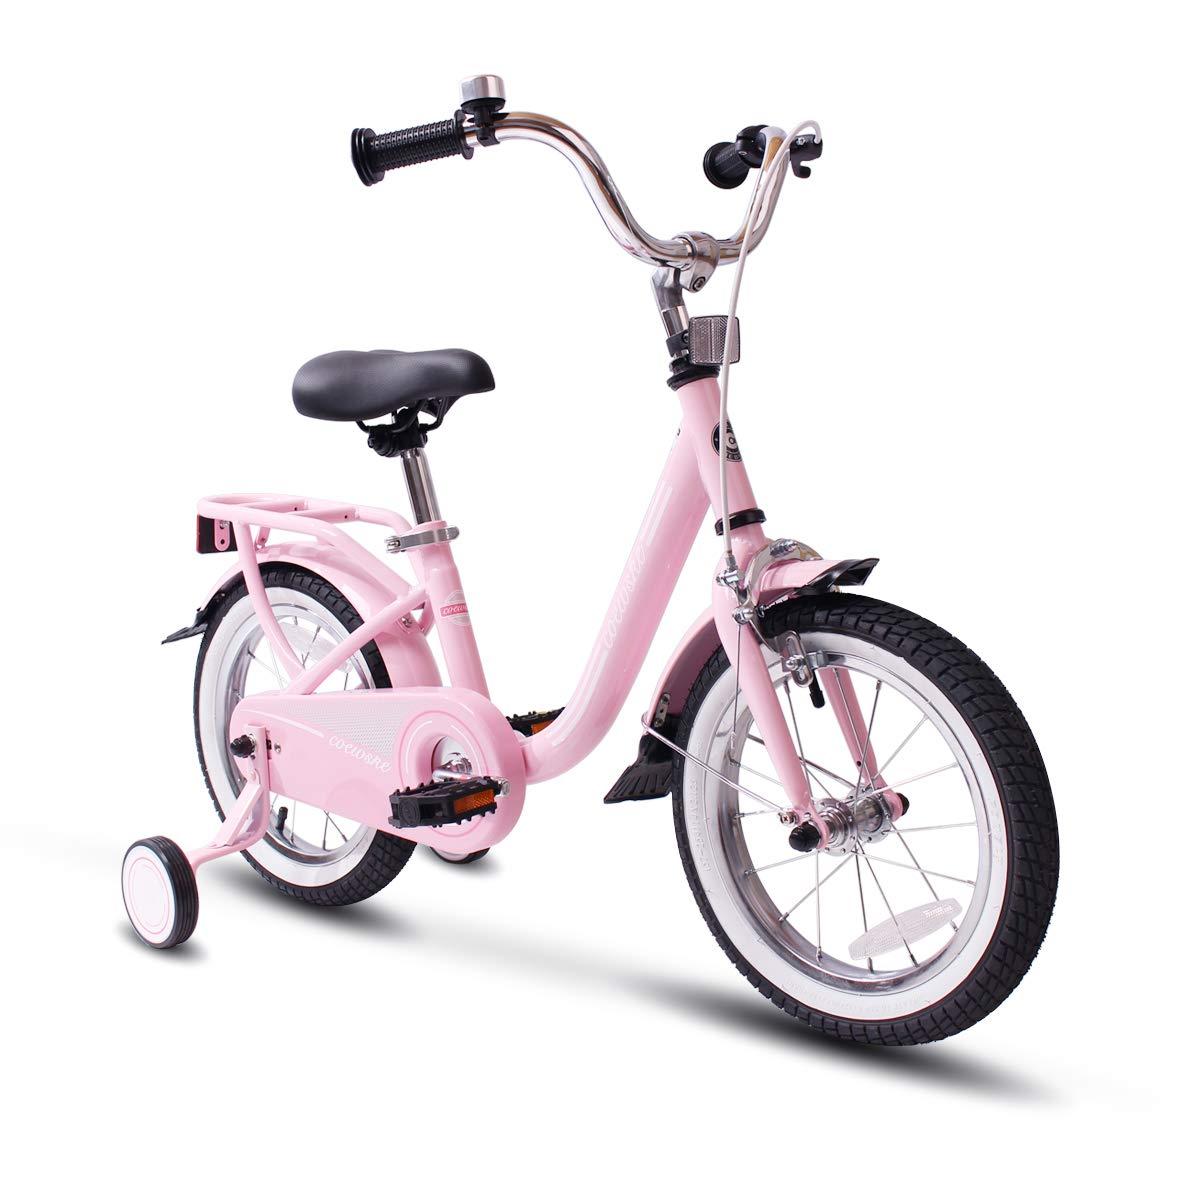 COEWSKE Kid's Bike Steel Frame Children Bicycle 14-16 Inch with Training Wheel product image